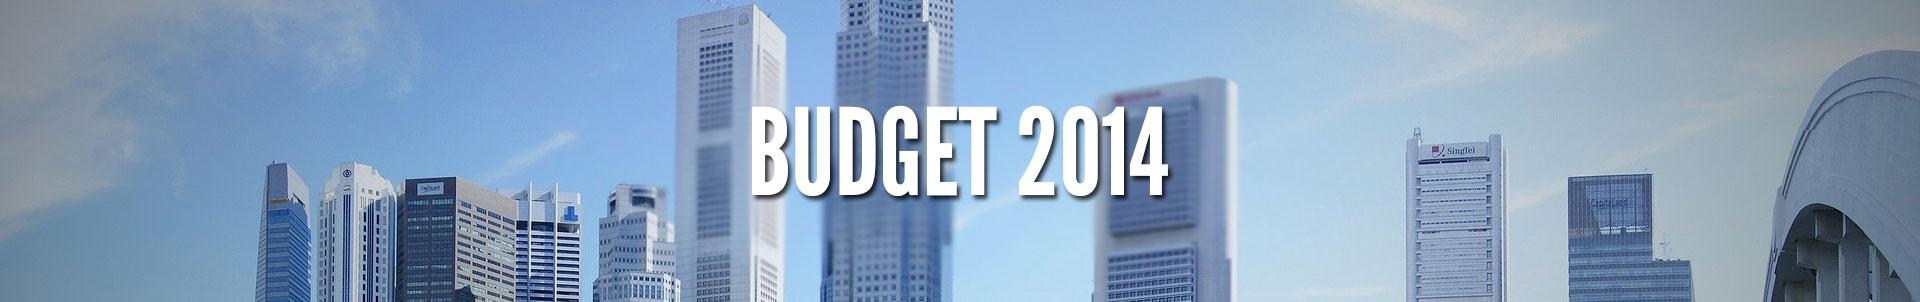 budget2014-header